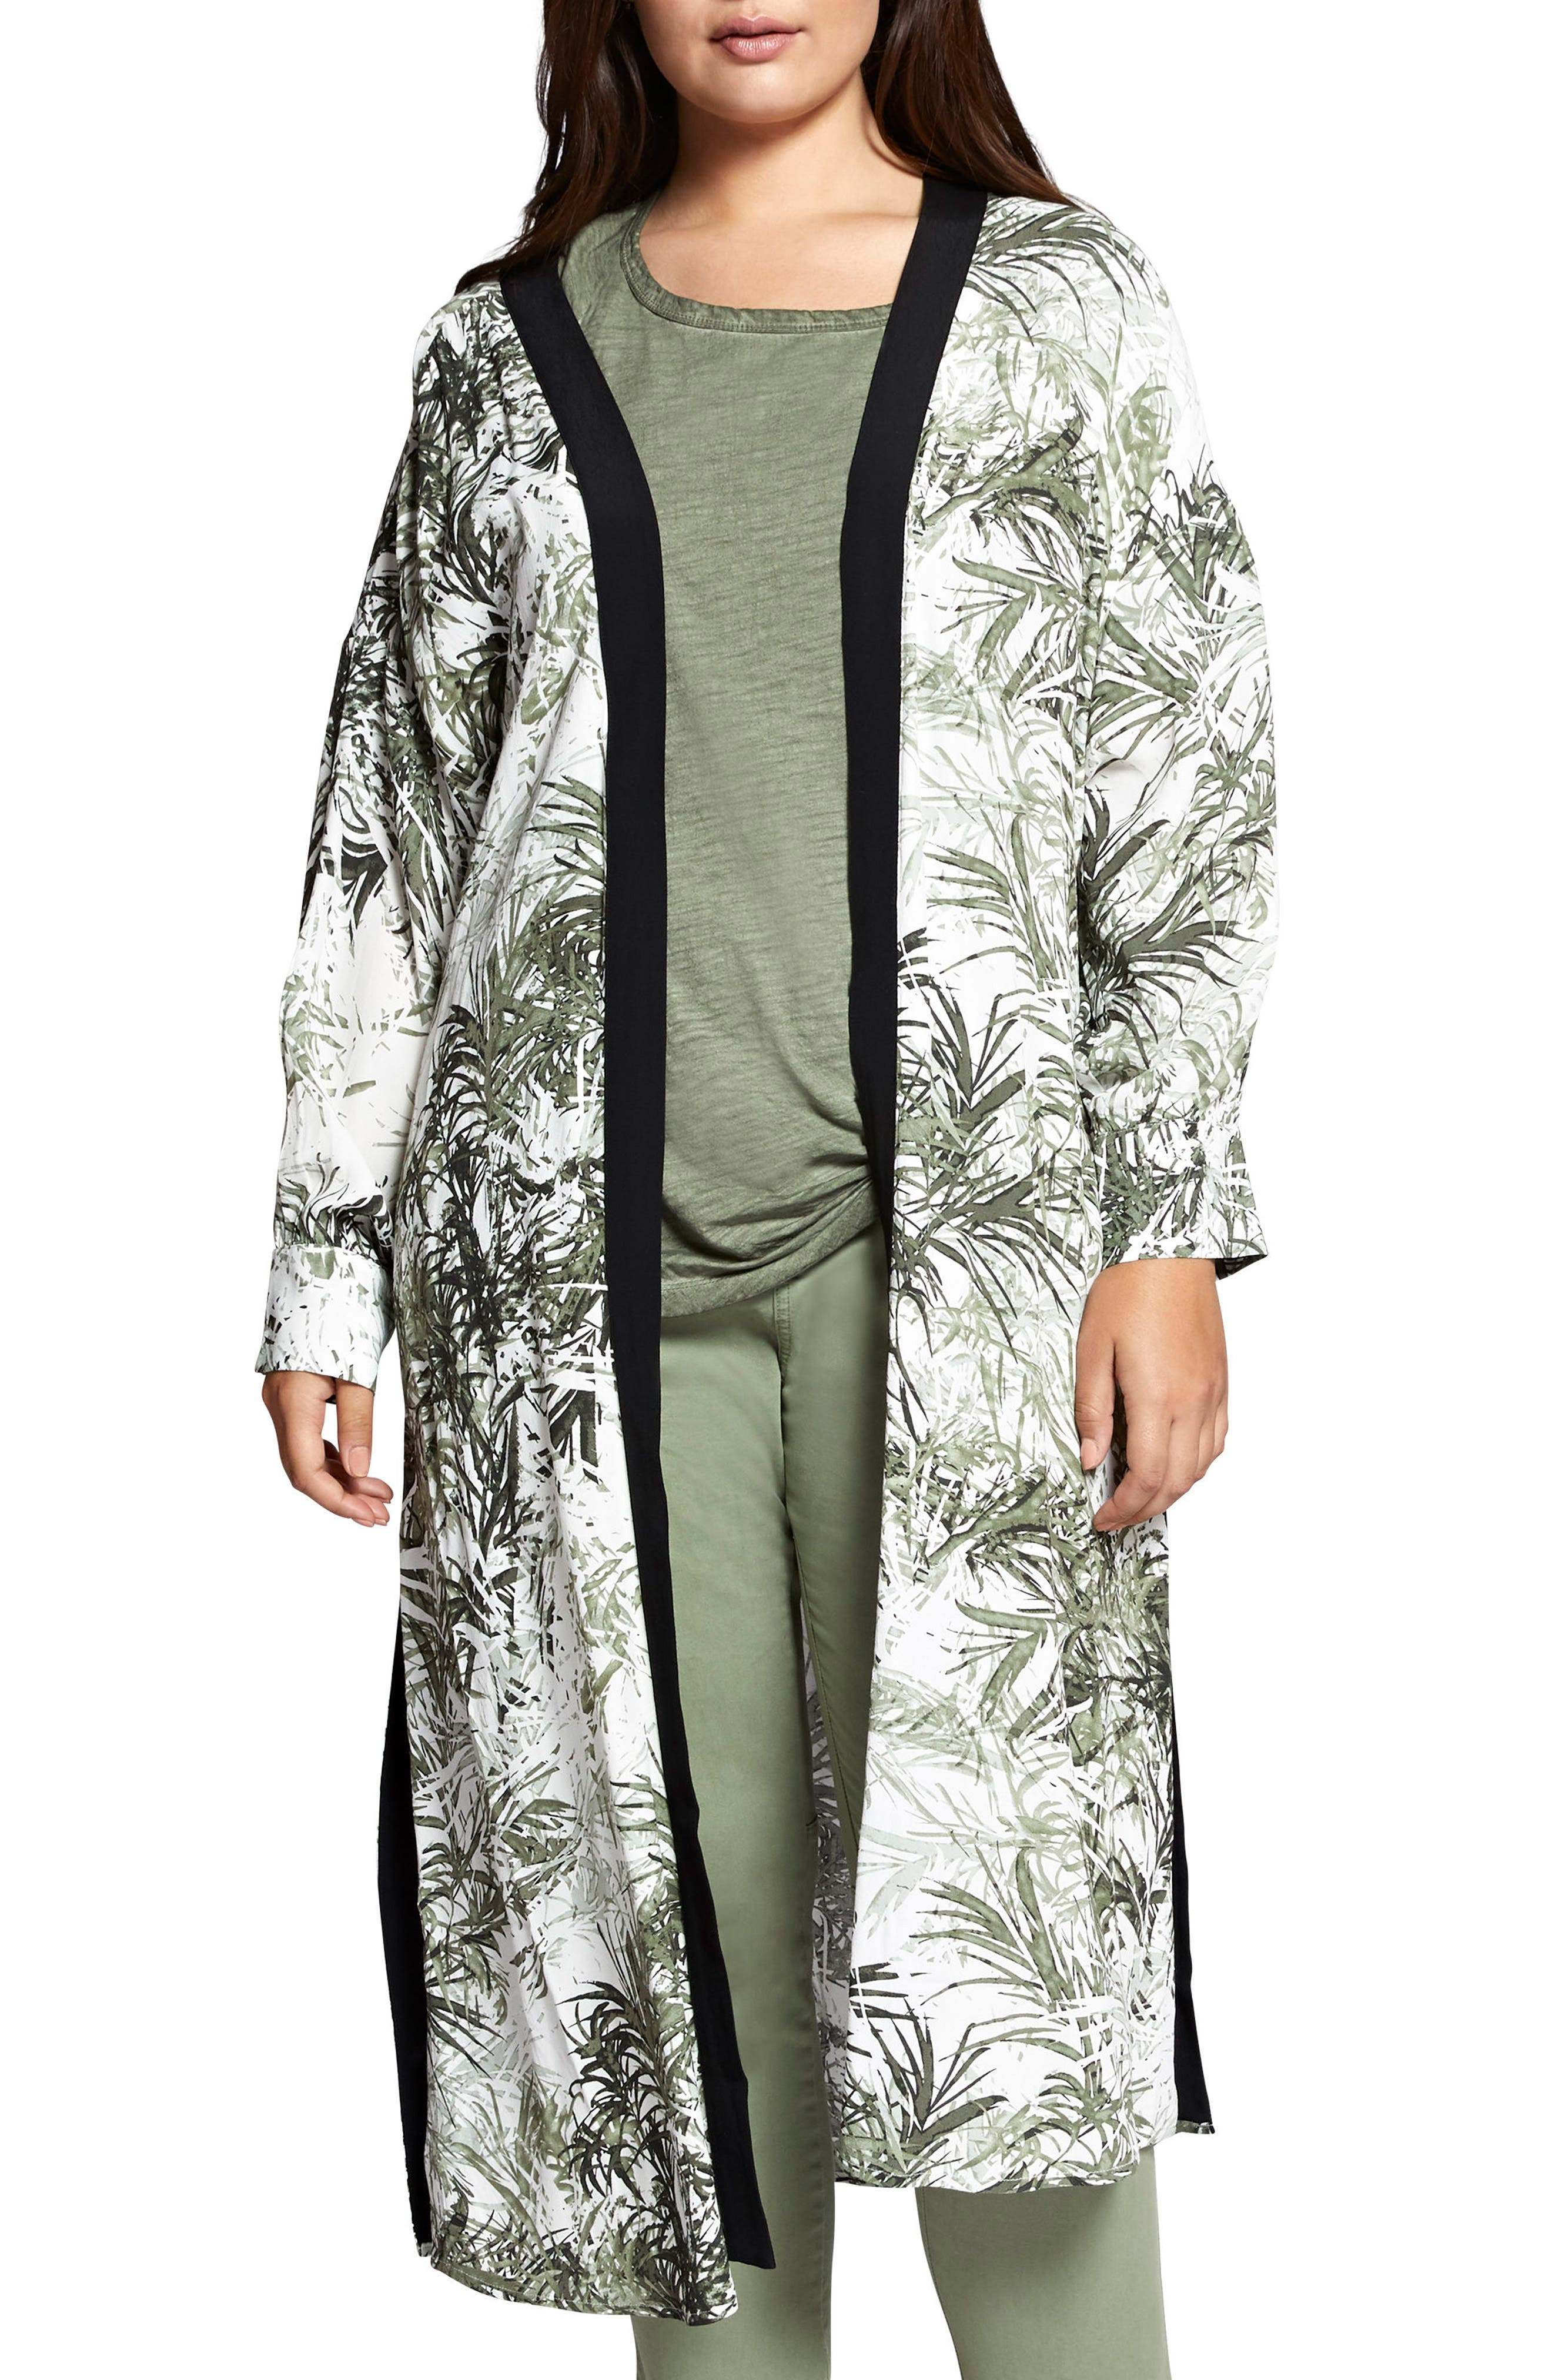 Calico Kimono,                             Alternate thumbnail 2, color,                             306